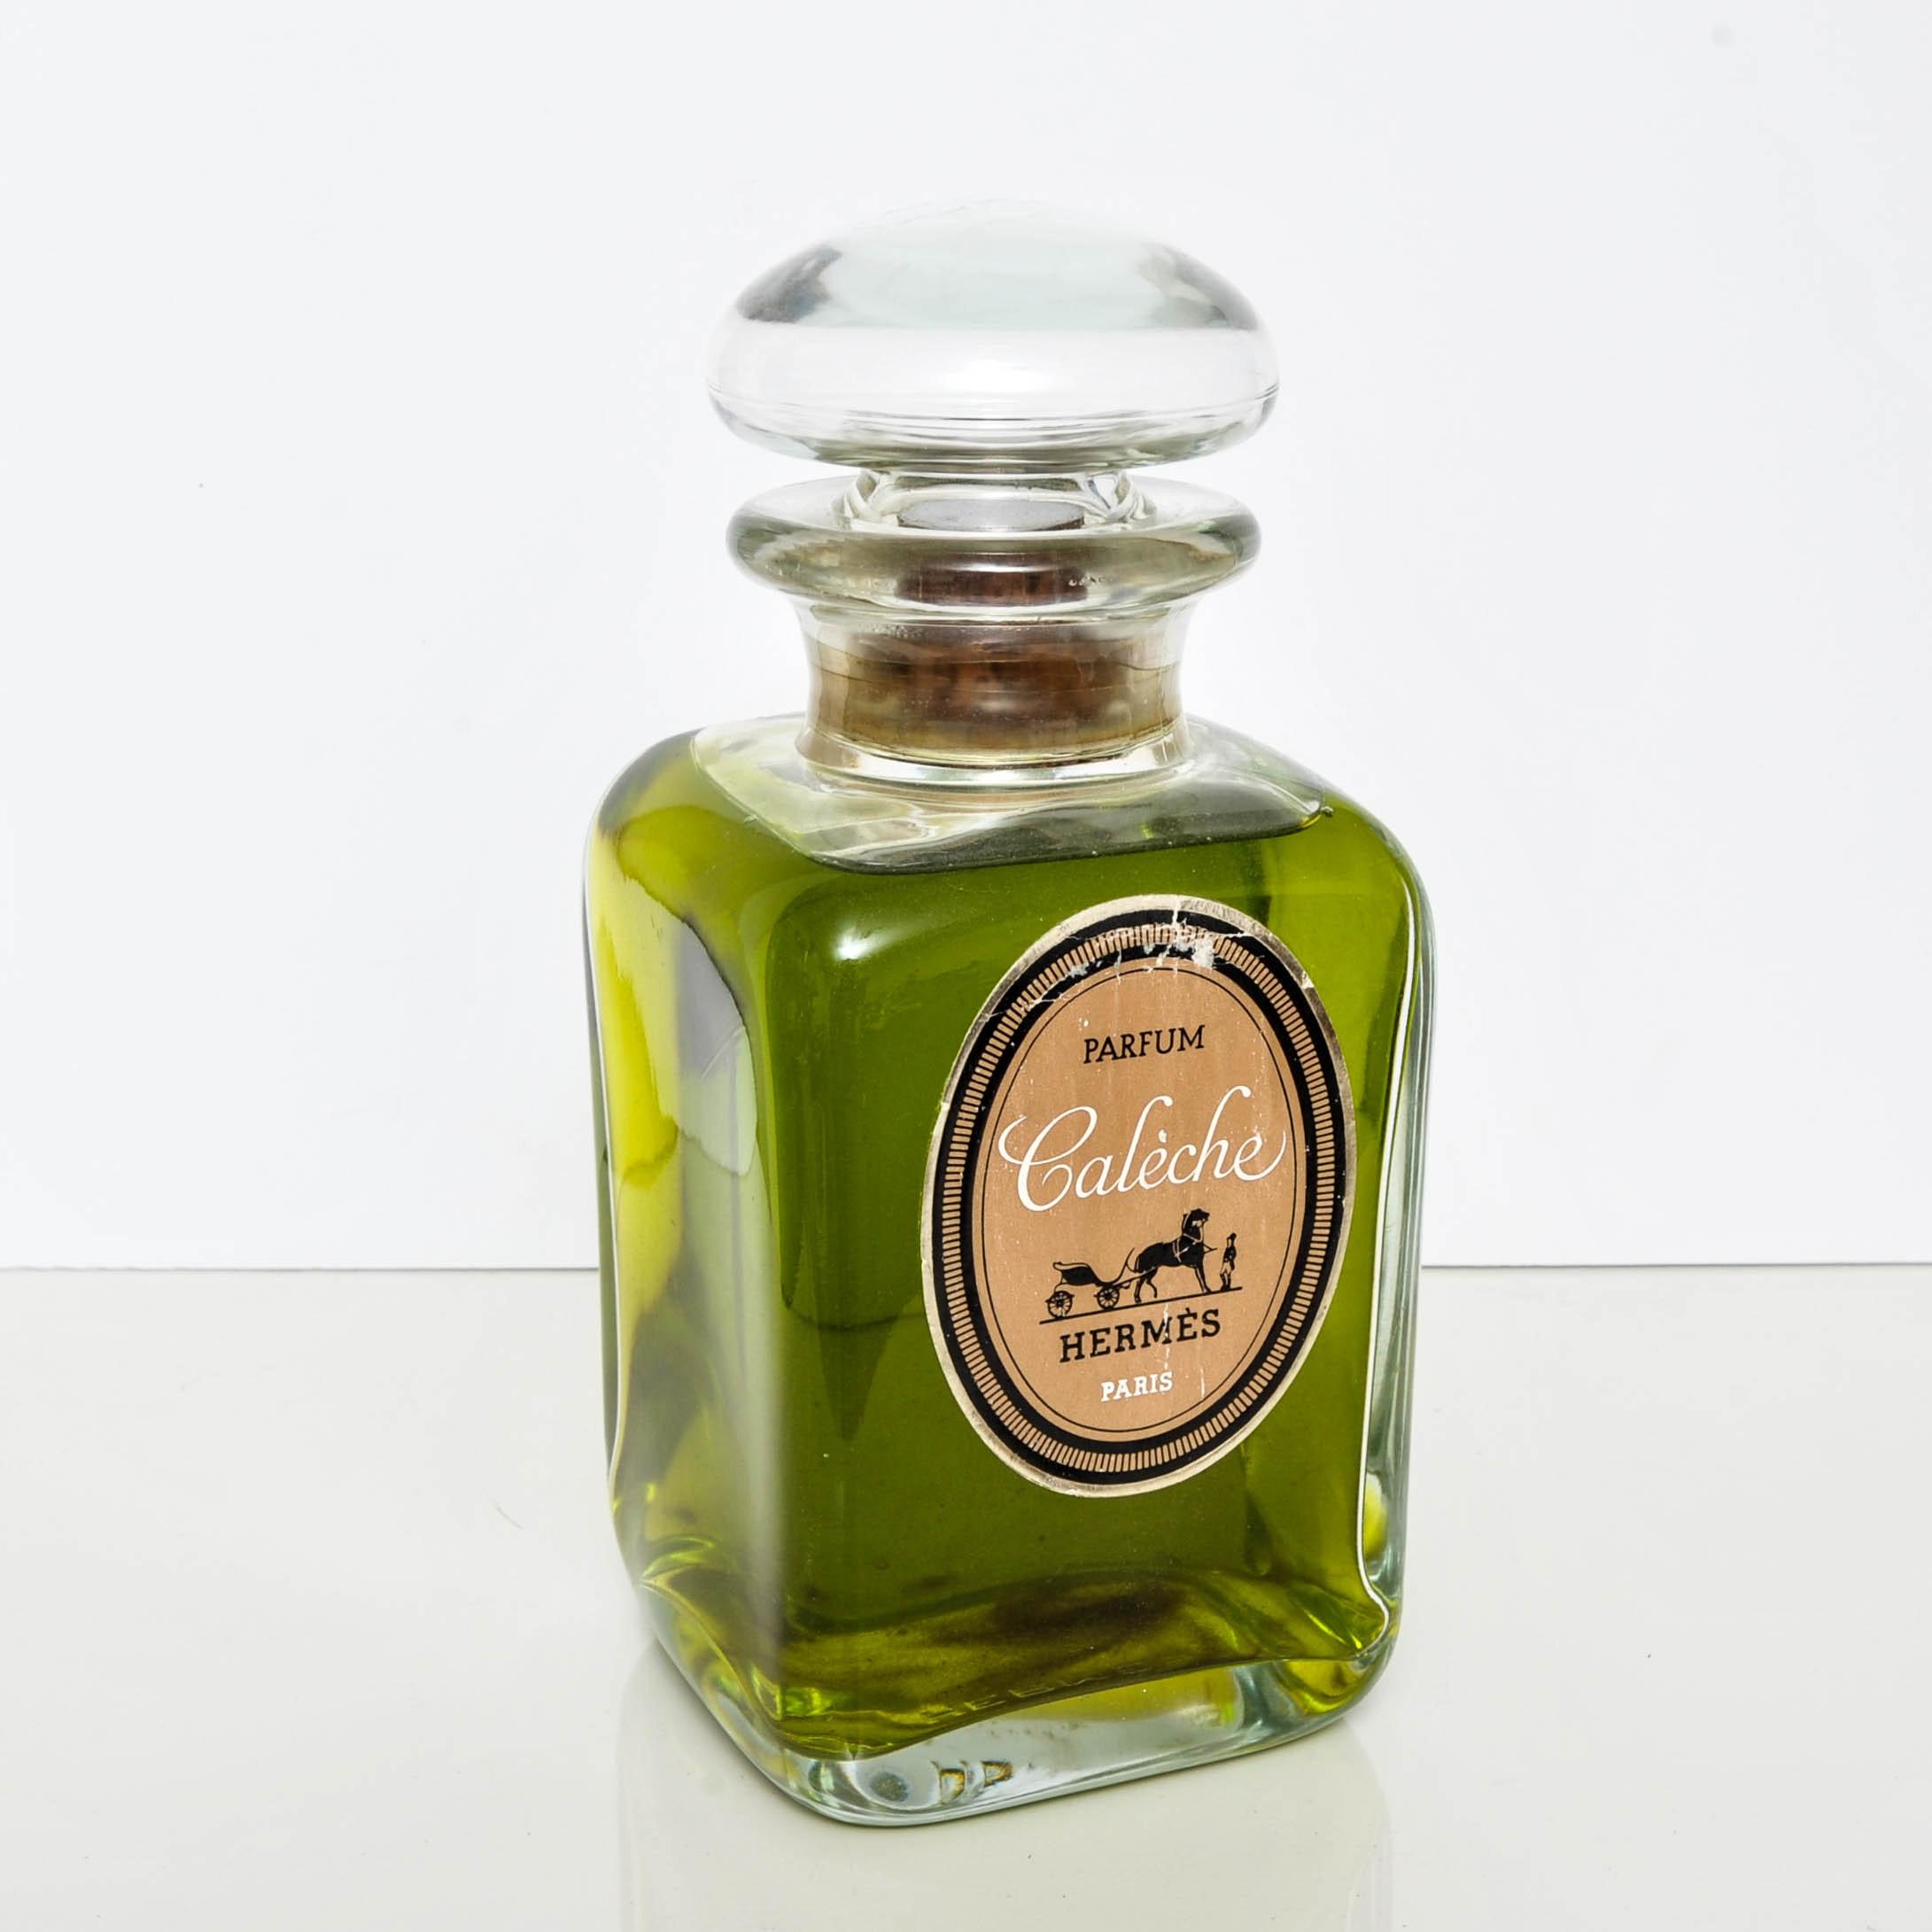 Caleche, Hermes Parfum Bottle